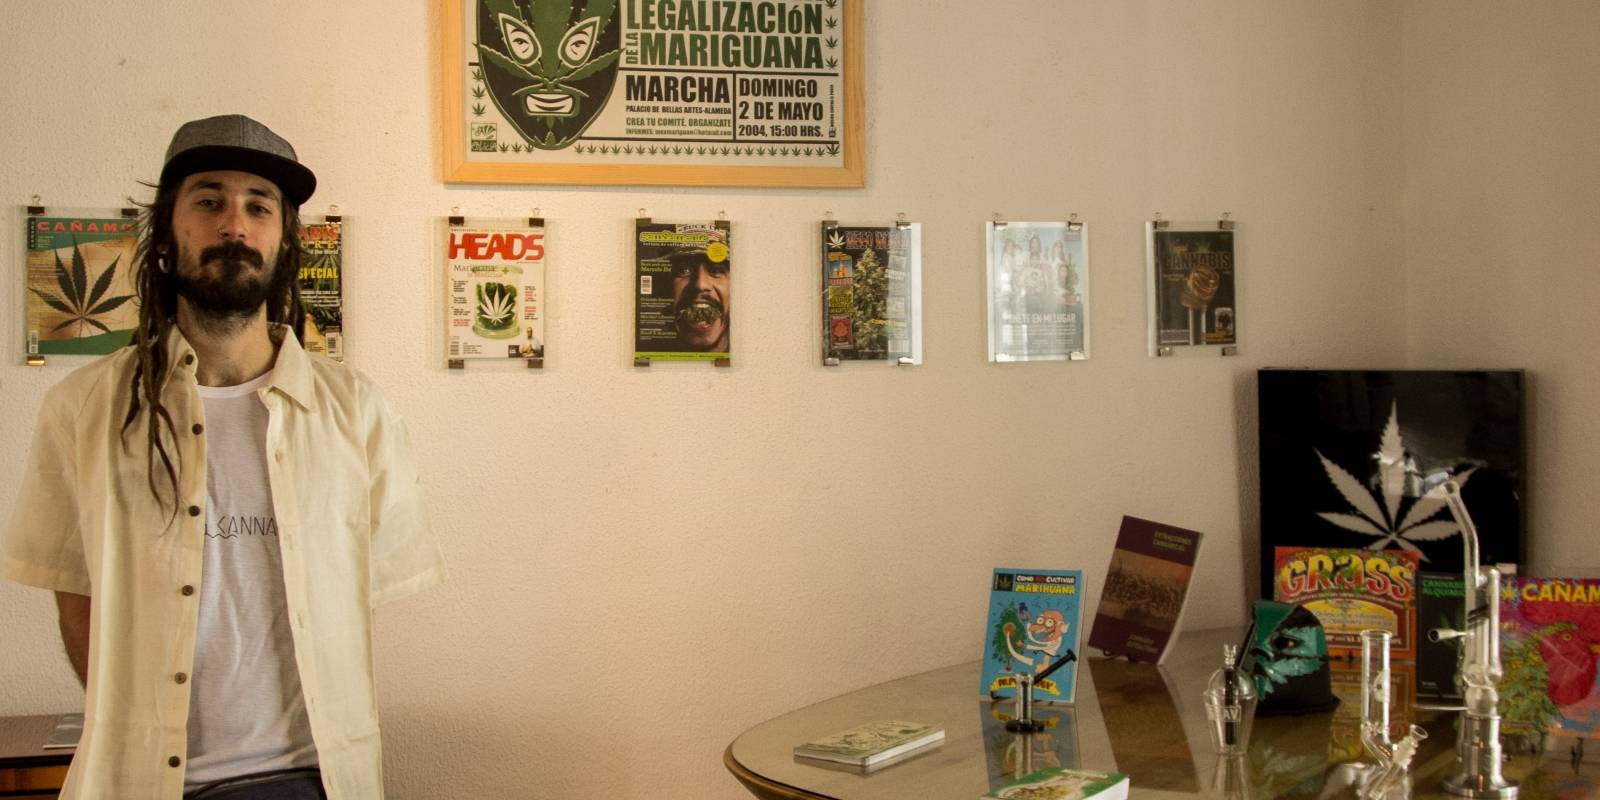 Nación Cannabis | Cannativa, el primer colectivo de educación cannábica en México como alternativa terapéutica